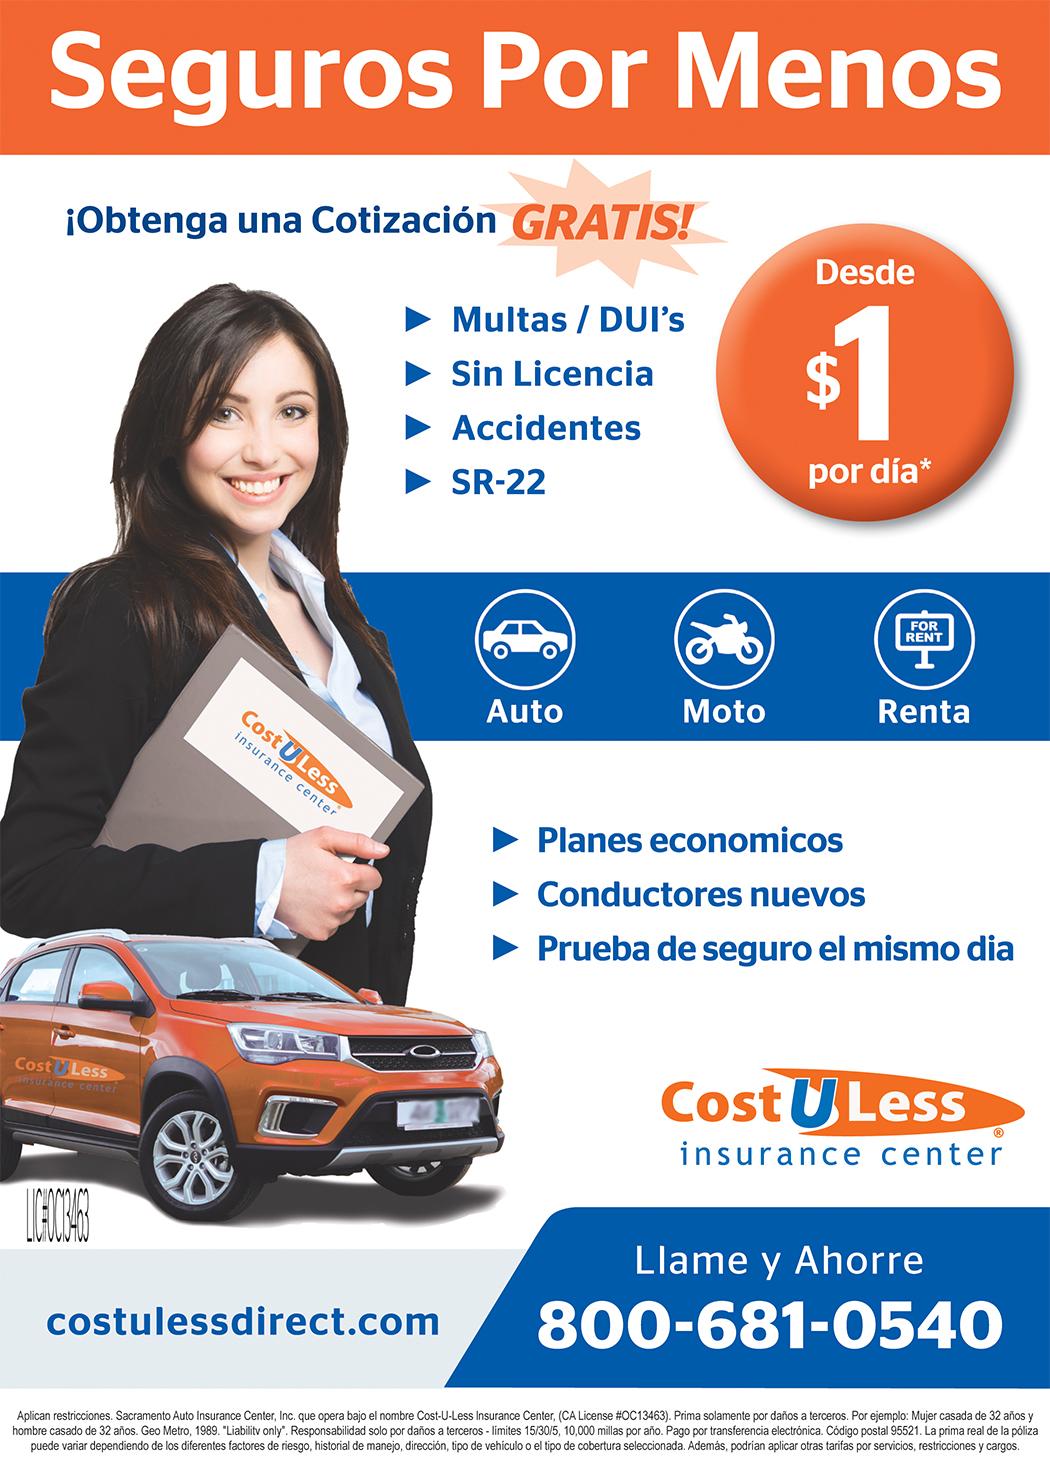 Cost U Less Insurance 1 Pag FEBRERO 2019-01.jpg